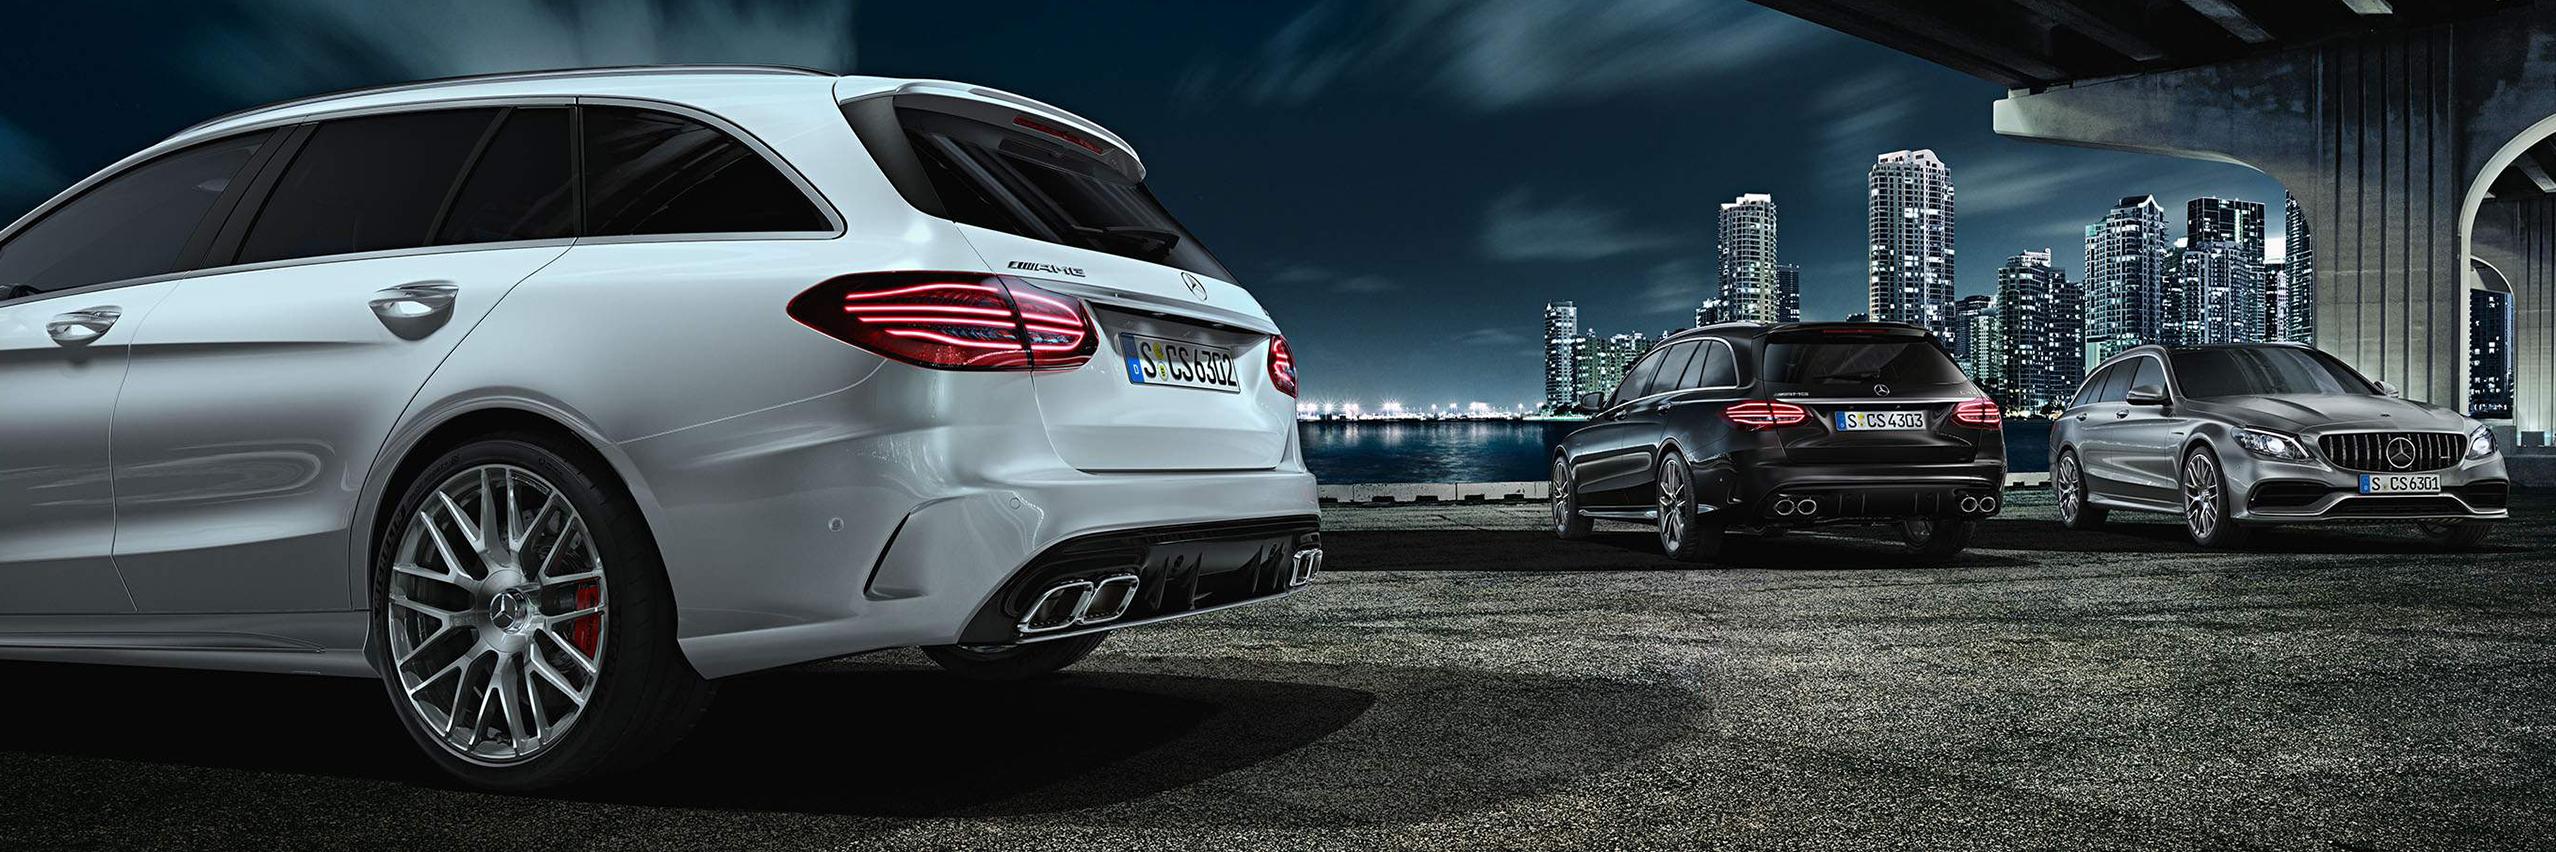 CAR-Avenue-Mercedes-AMG-Classe-C-Break-07